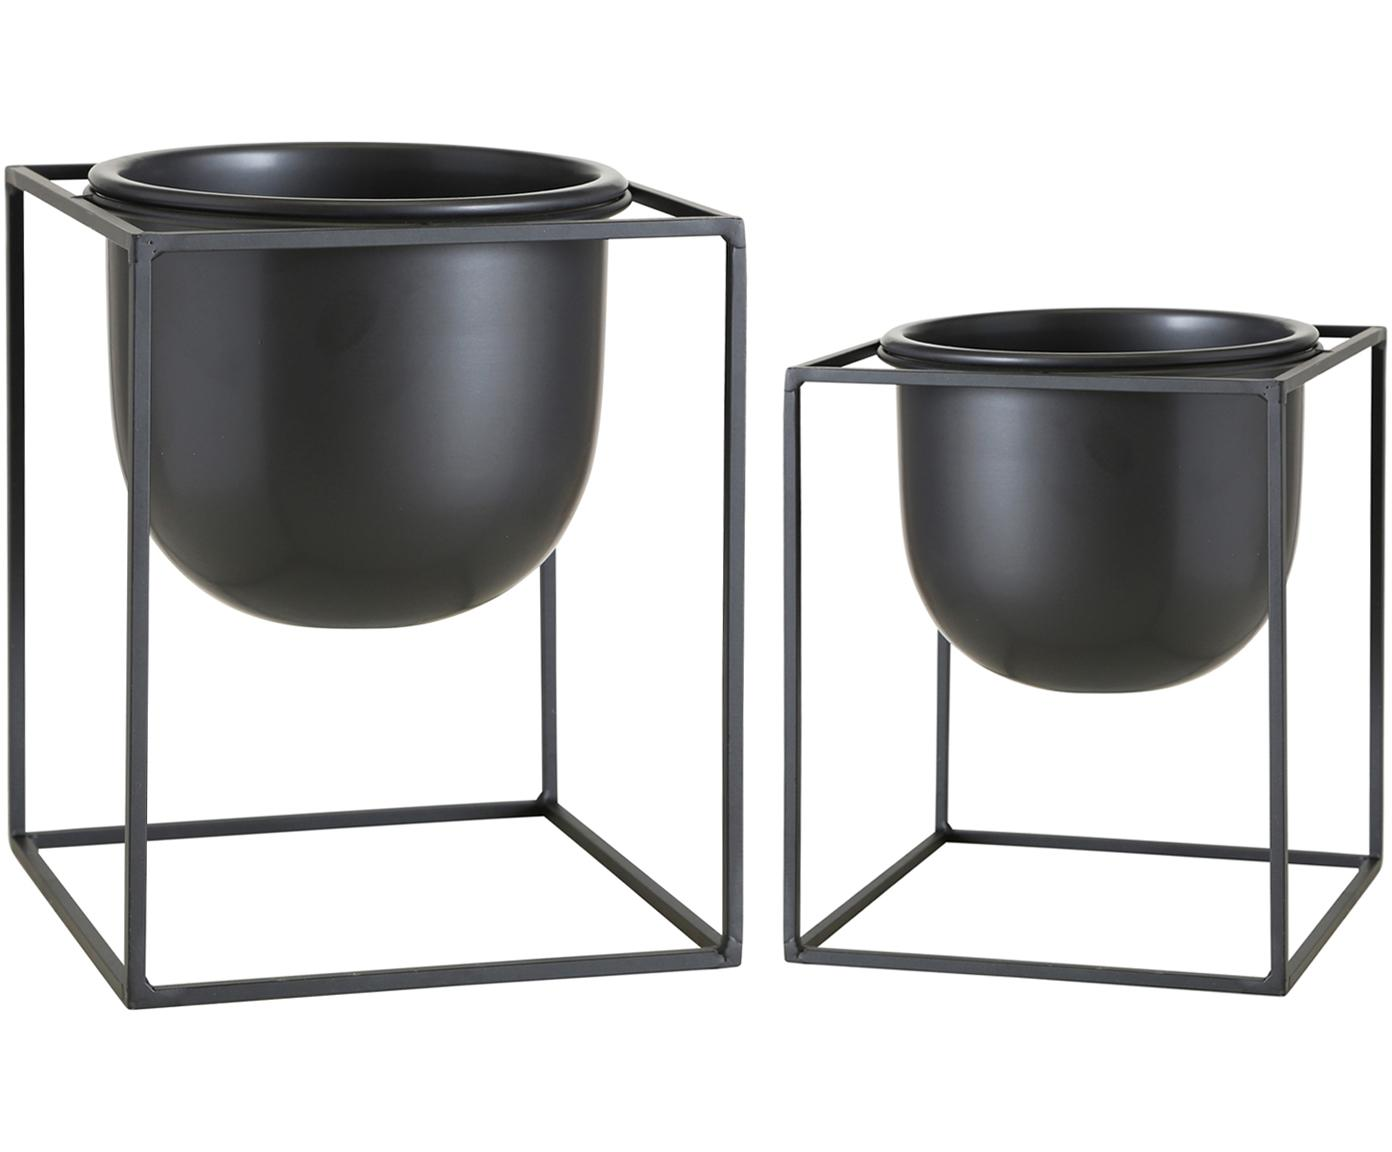 Kleines Übertopf-Set Kumbo aus Metall, 2-tlg., Metall, Schwarz, Sondergrößen